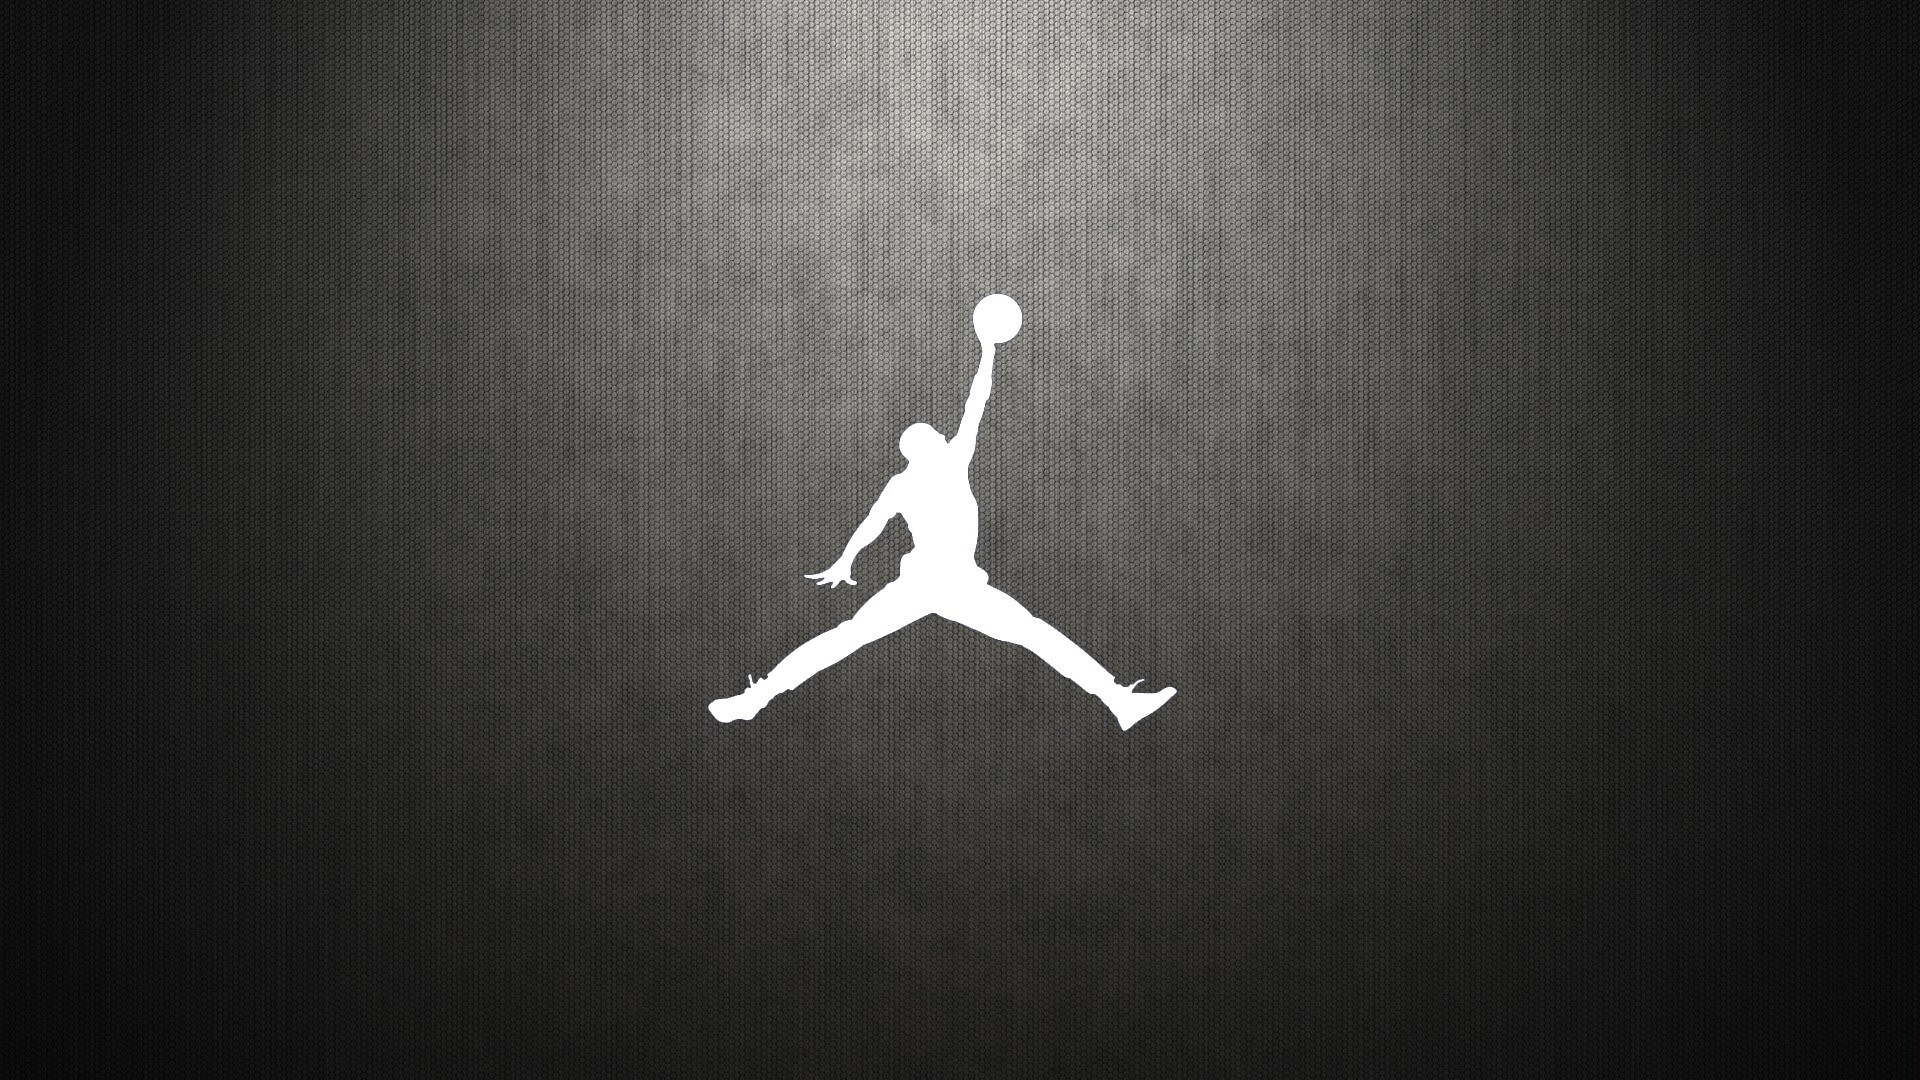 Nike logos wallpapers - Cool nike iphone wallpapers ...